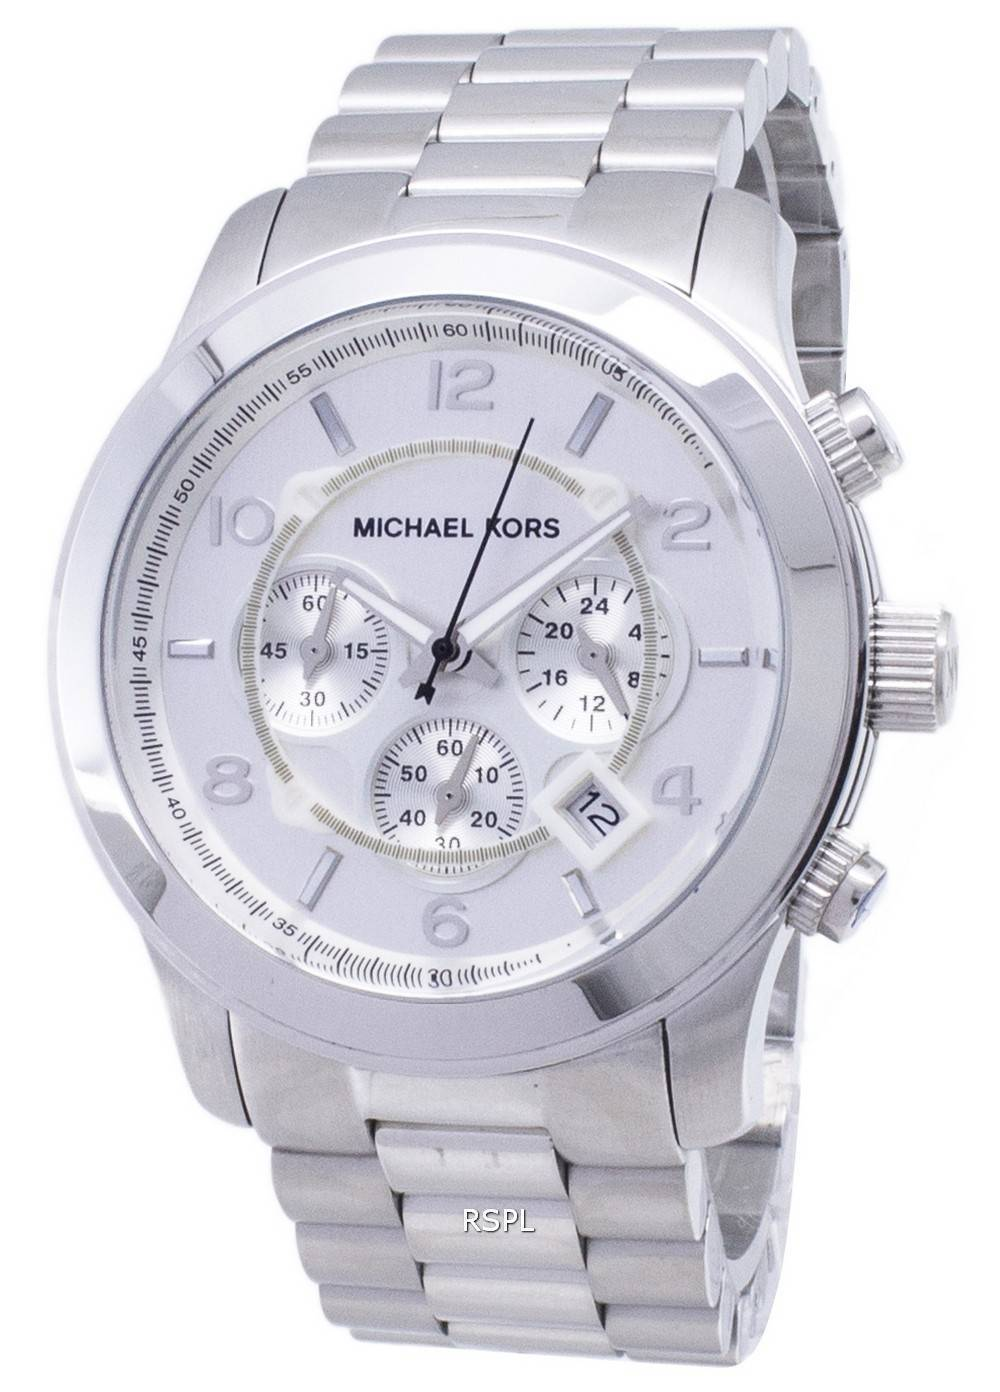 4ab53adddc2d Michael Kors Silver Runway MK8086 Mens Watch Singapore